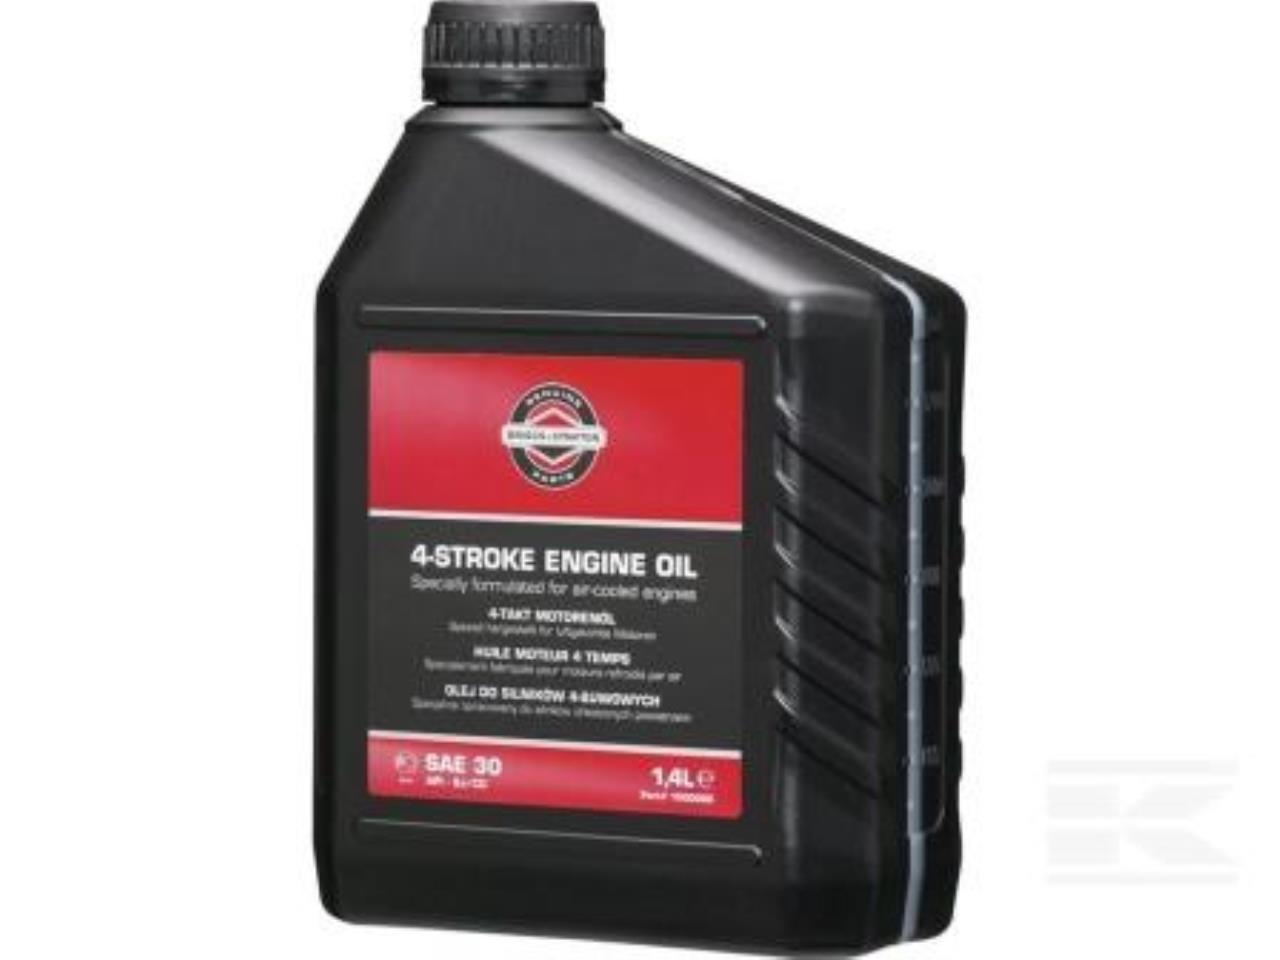 Briggs & Stratton SAE30 motorolie, 1,4 ltr.